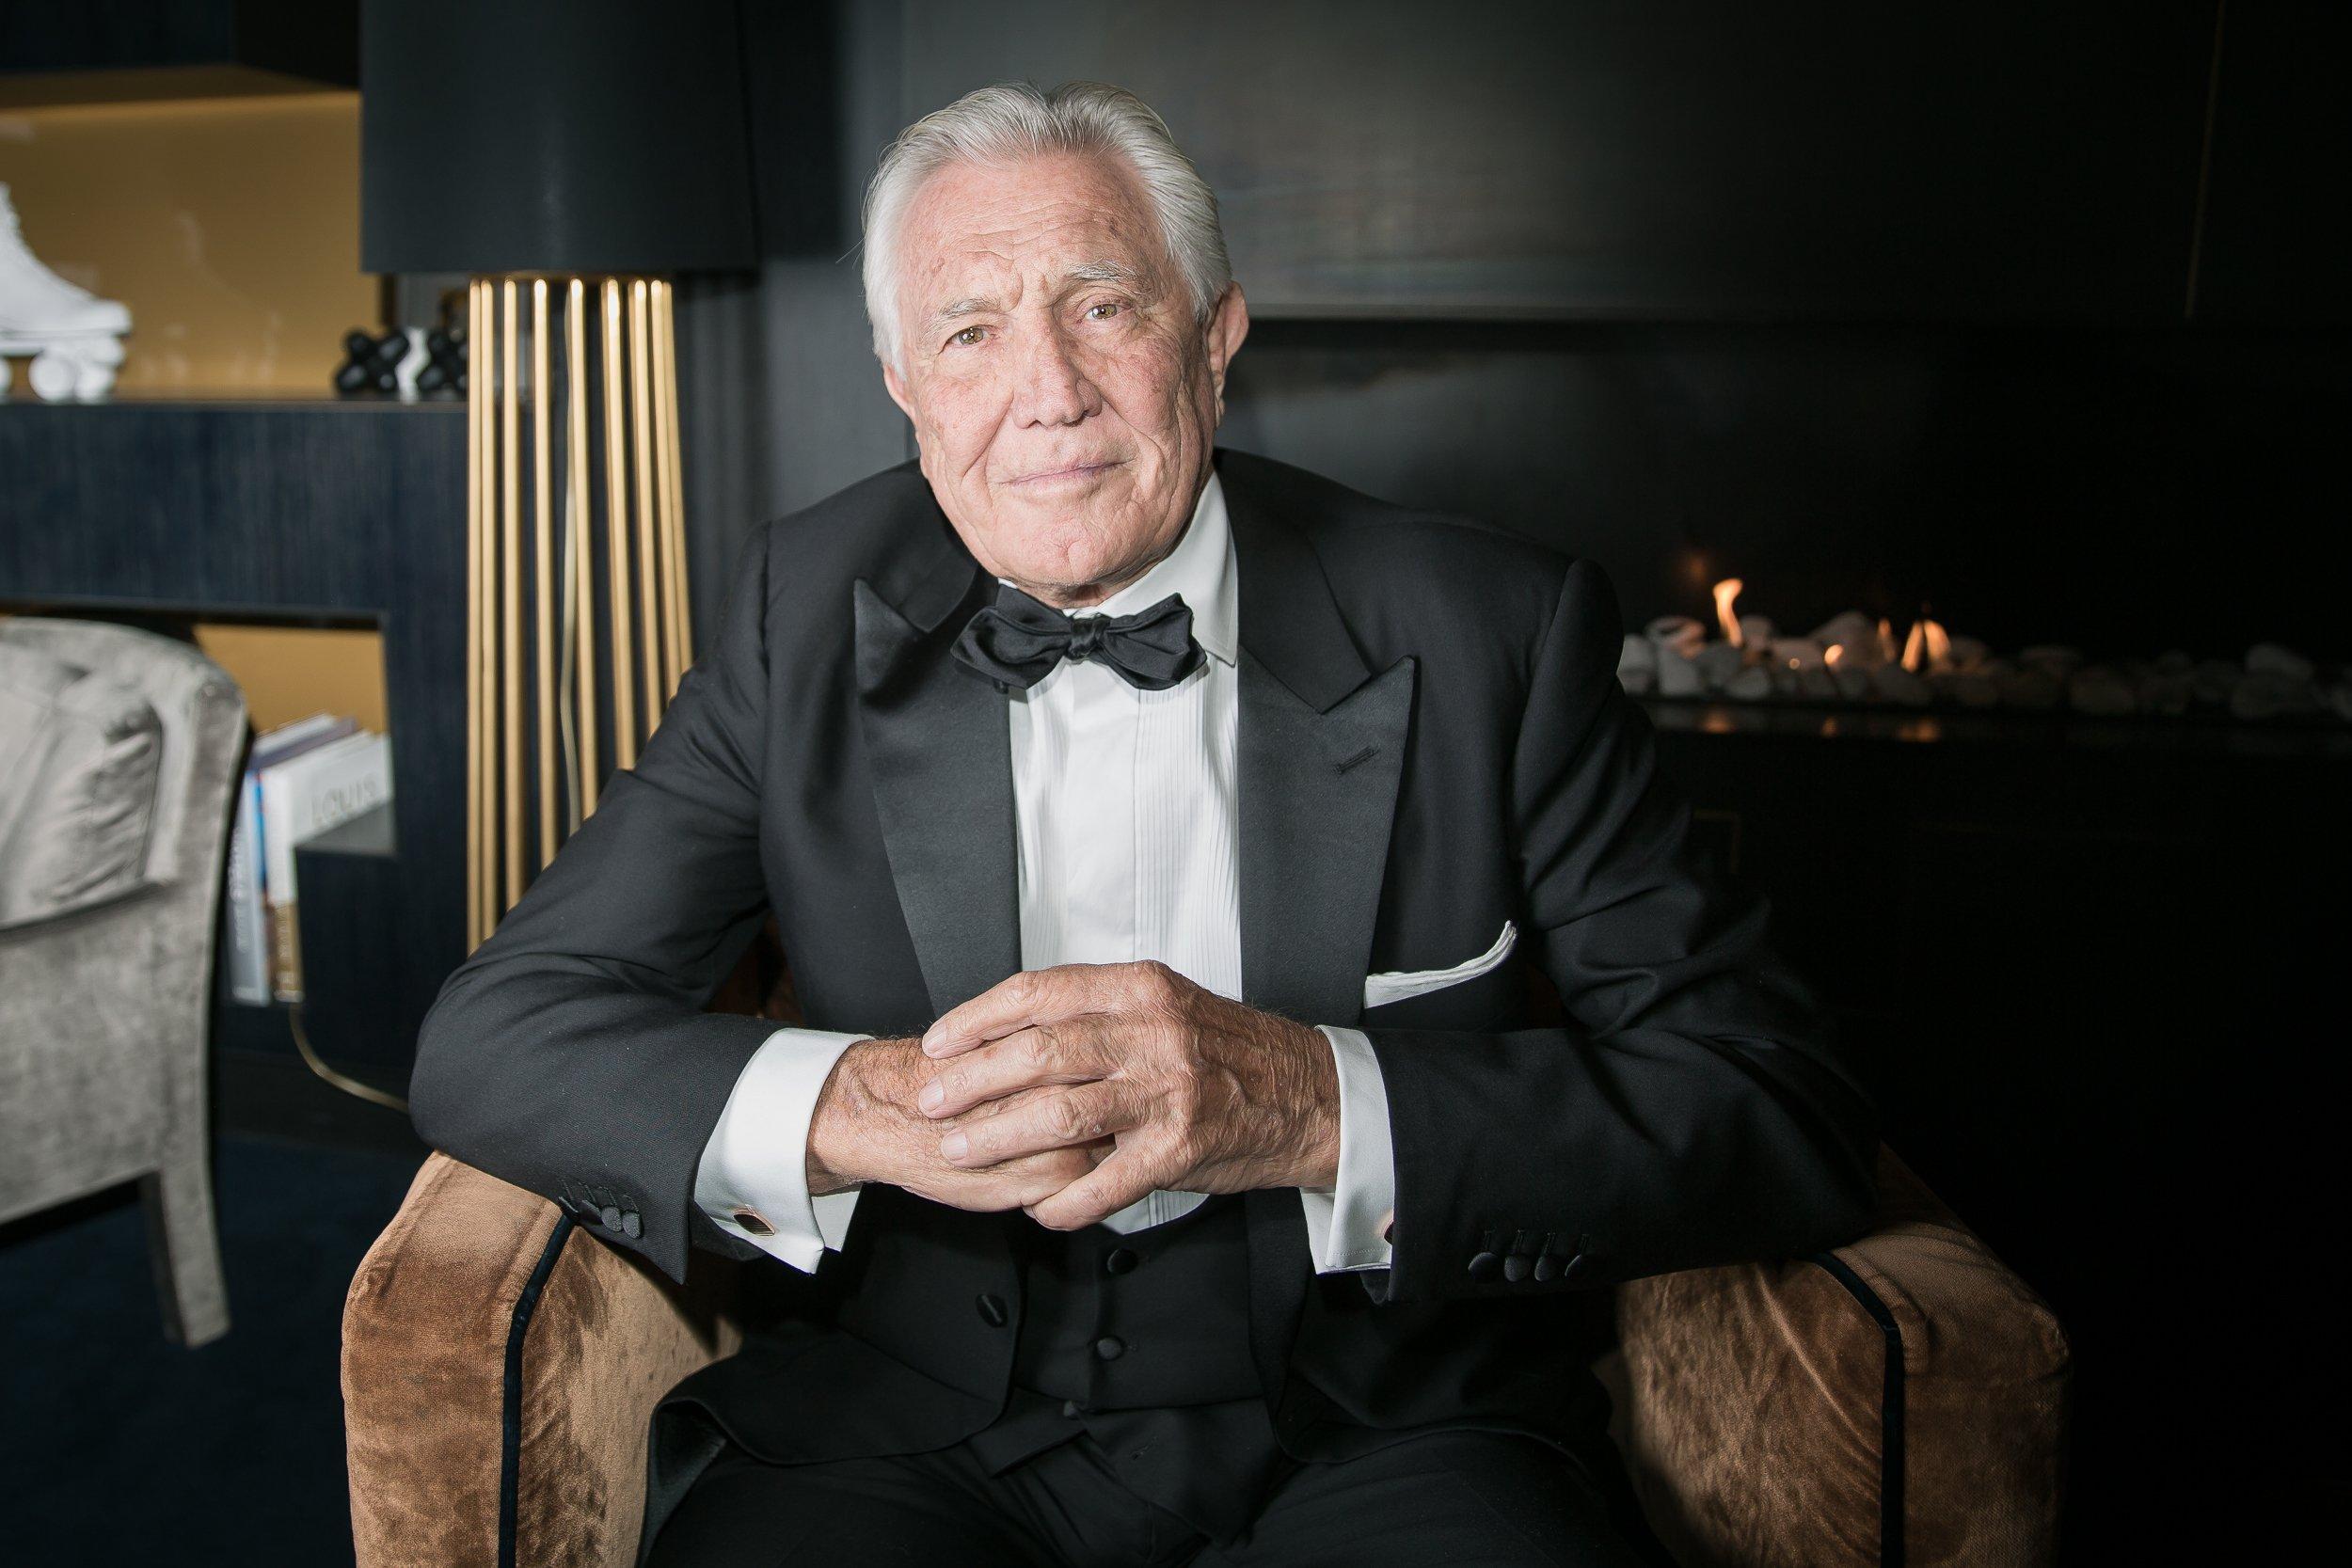 James-Bond-Oslo-George-Lazenby